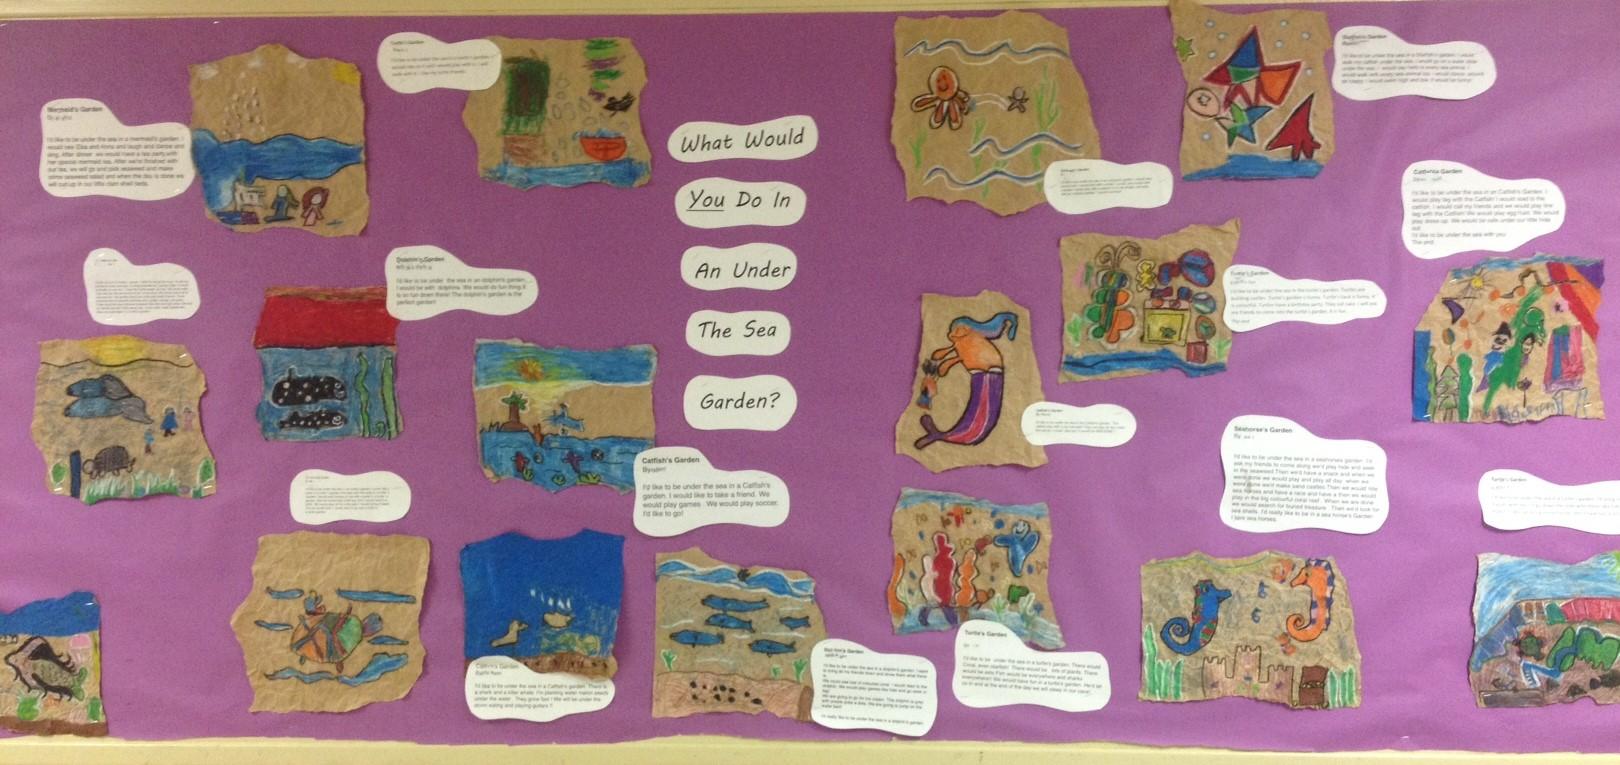 hight resolution of Octopus's Garden by Ringo Starr Grade 1/2 Creative Writing – Mme G.C. -Work  in Progress